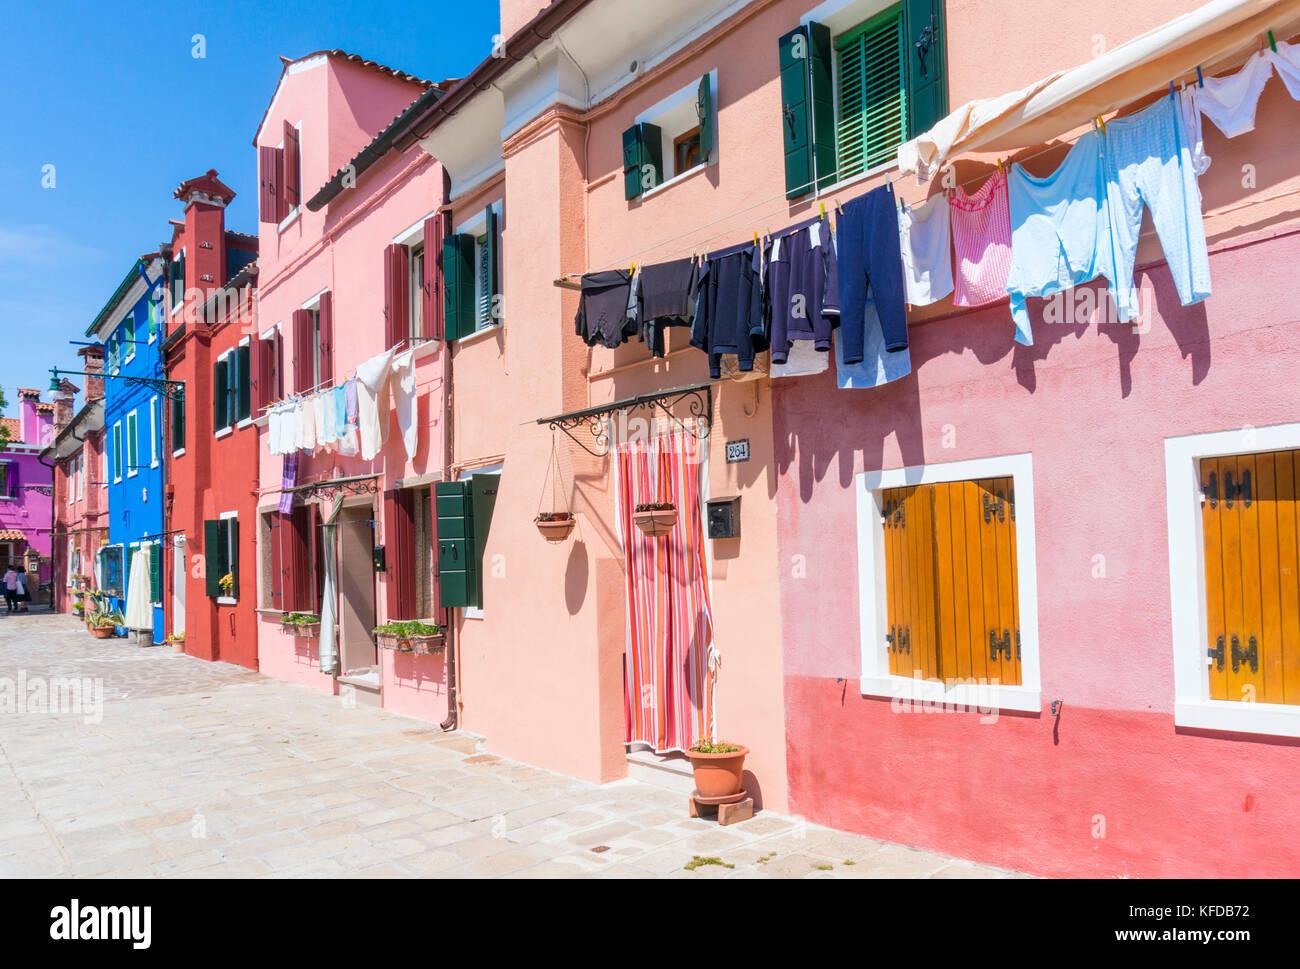 Venedig Italien Venedig bunte Häuser an einem Kanal auf der Insel Burano Venedig Lagune Metropolitan Stadt Stockbild